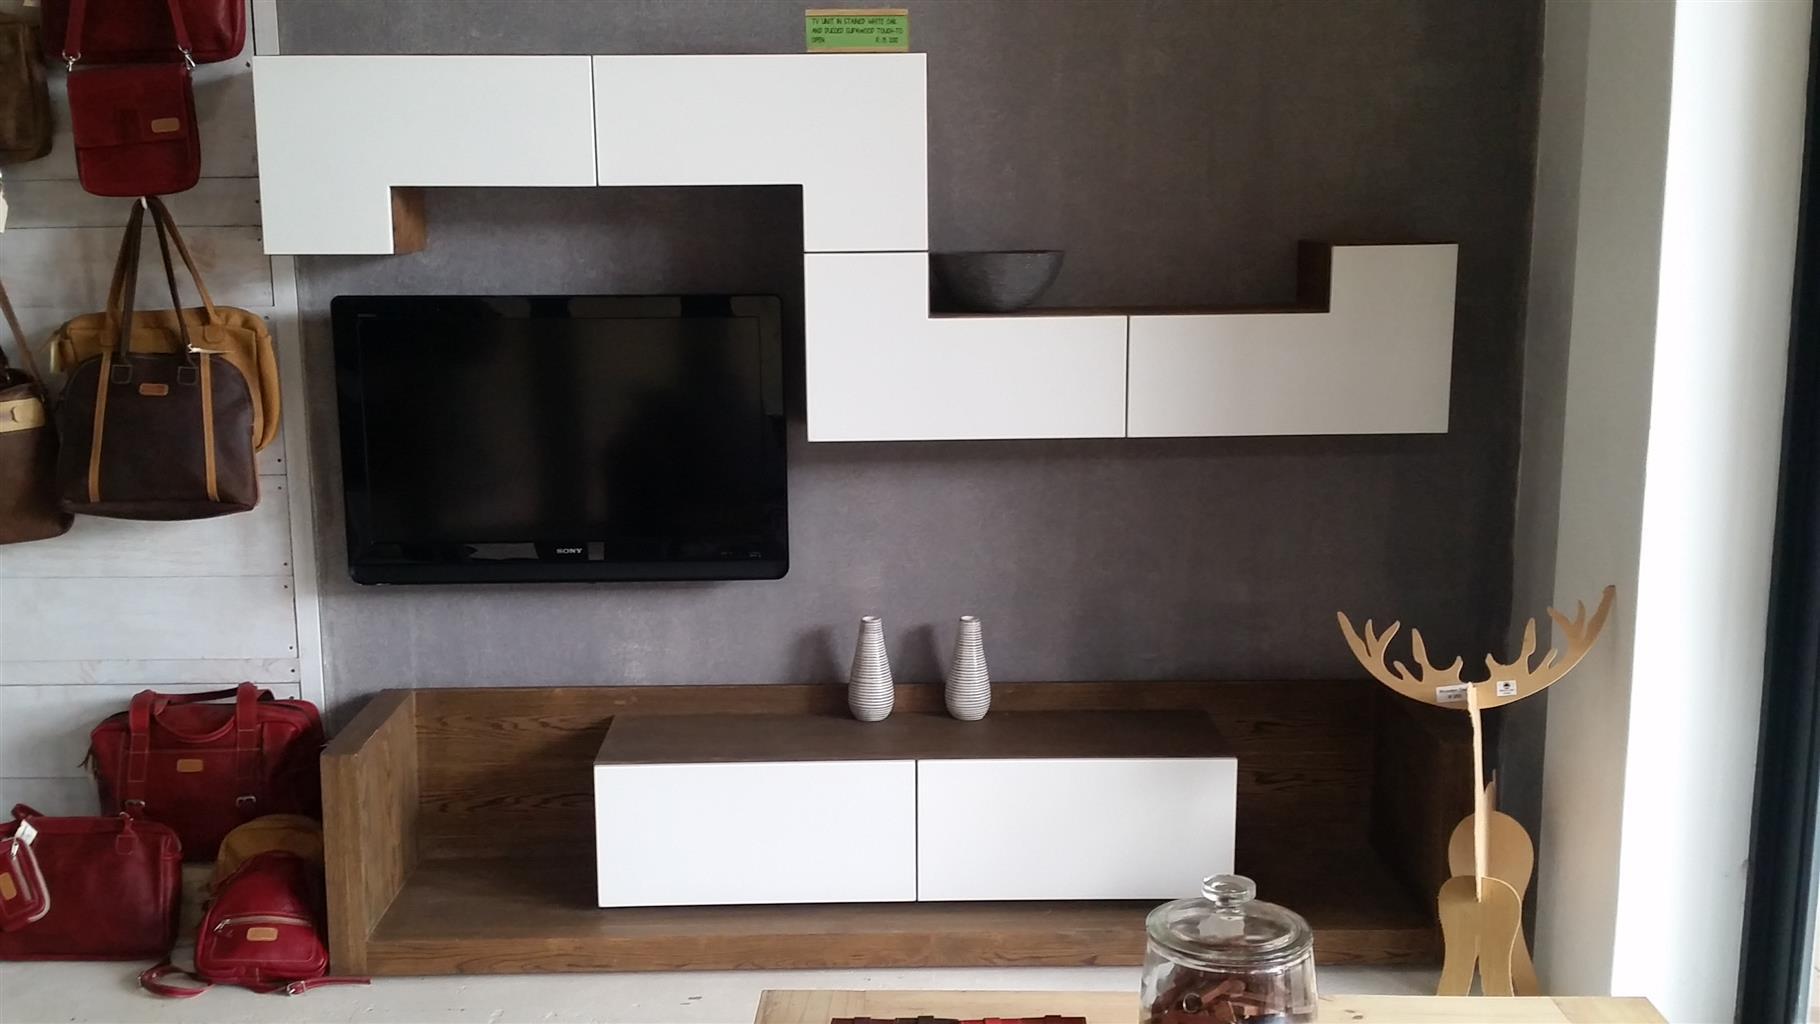 Wall mounted Tv unit | Junk Mail